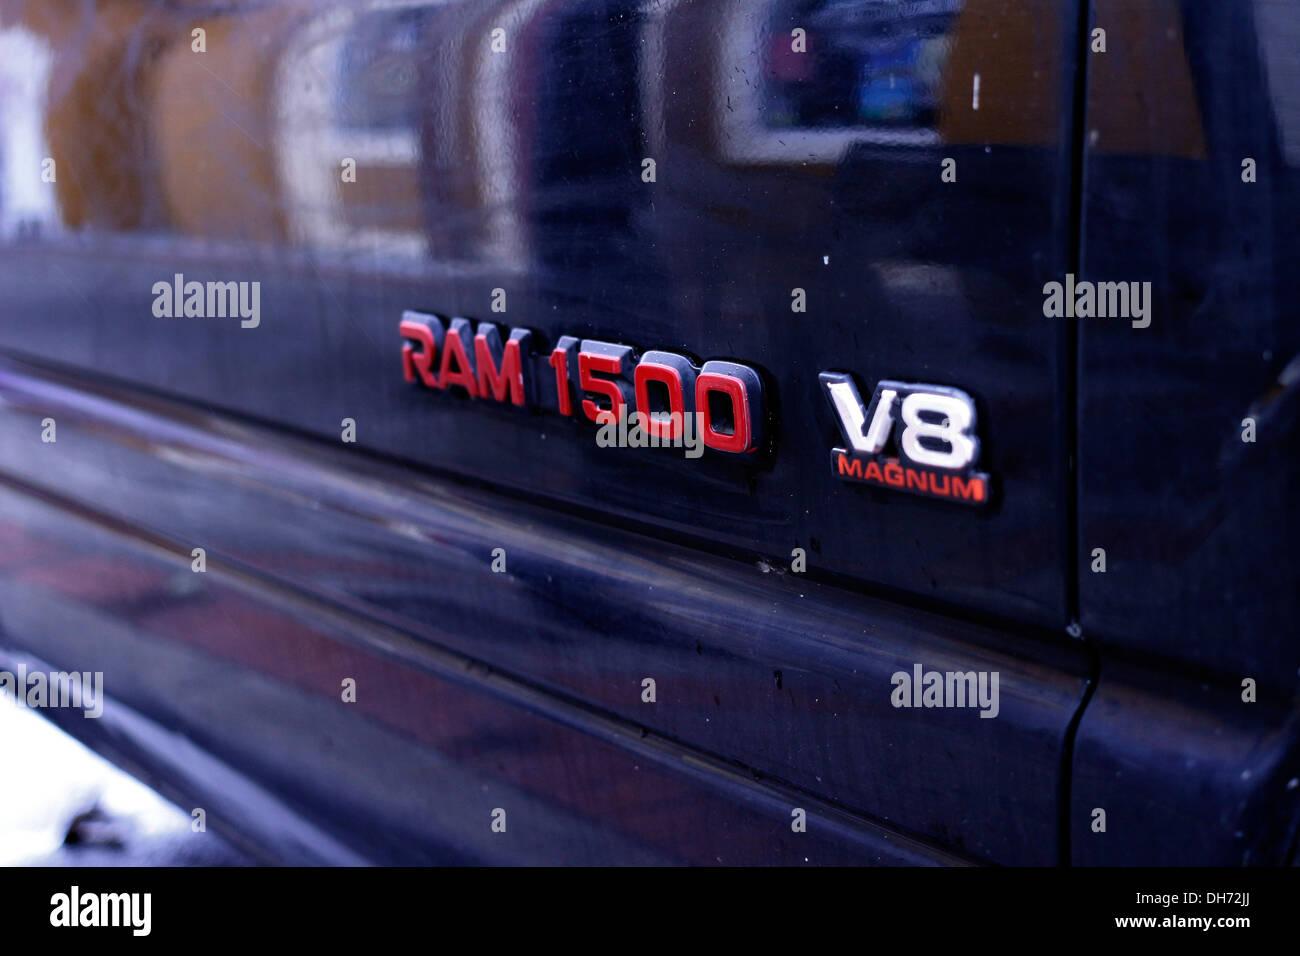 Gas Guzzler Stock Photos & Gas Guzzler Stock Images - Alamy on wheel barrow with v8, polaris with v8, 4 wheeler with v8,